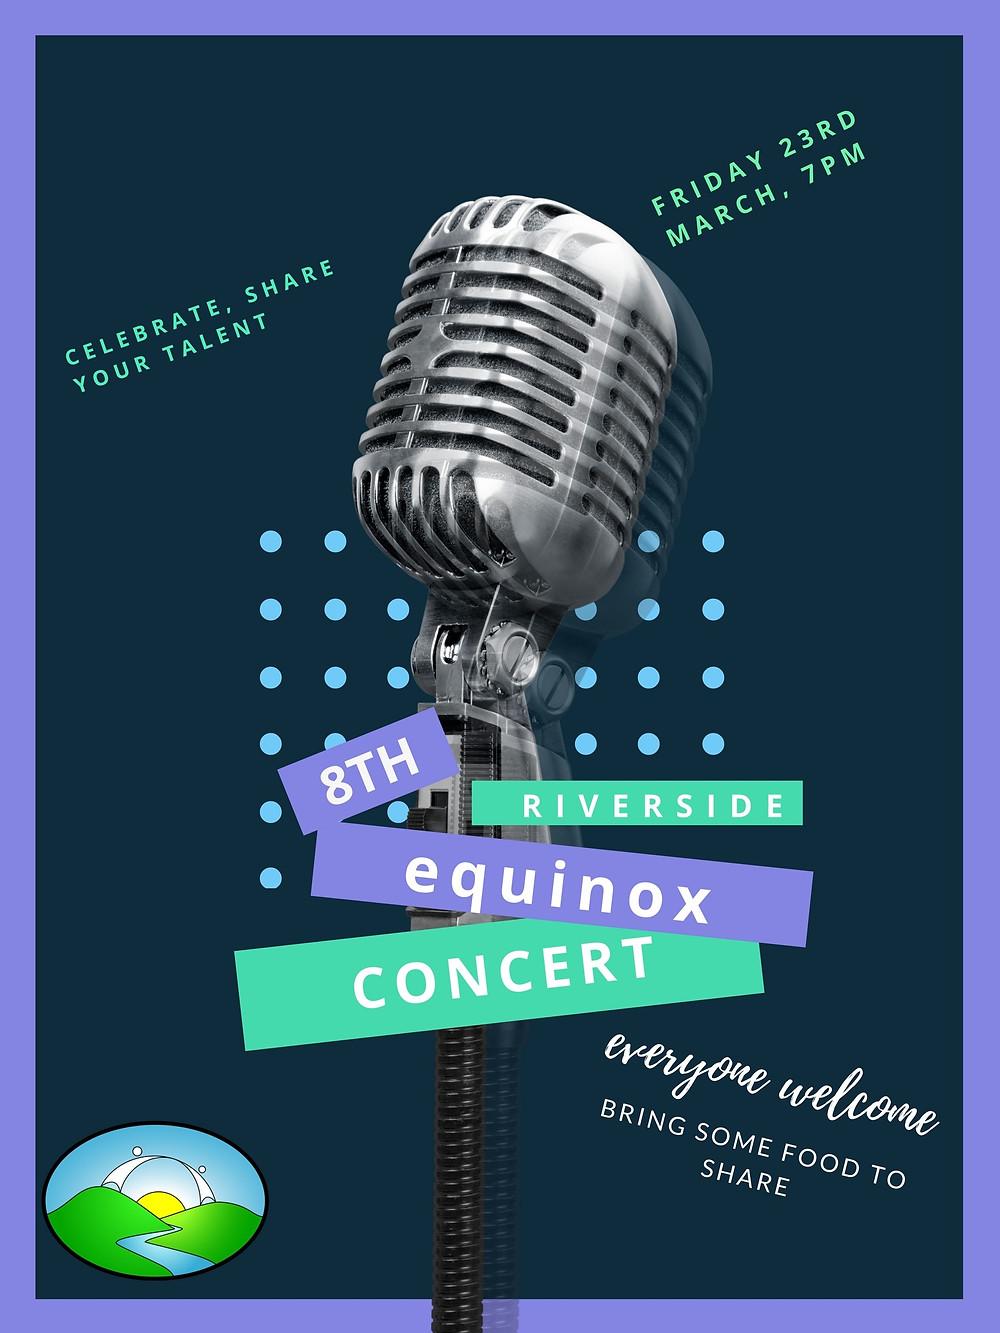 Equinox Concert at Riverside Poster